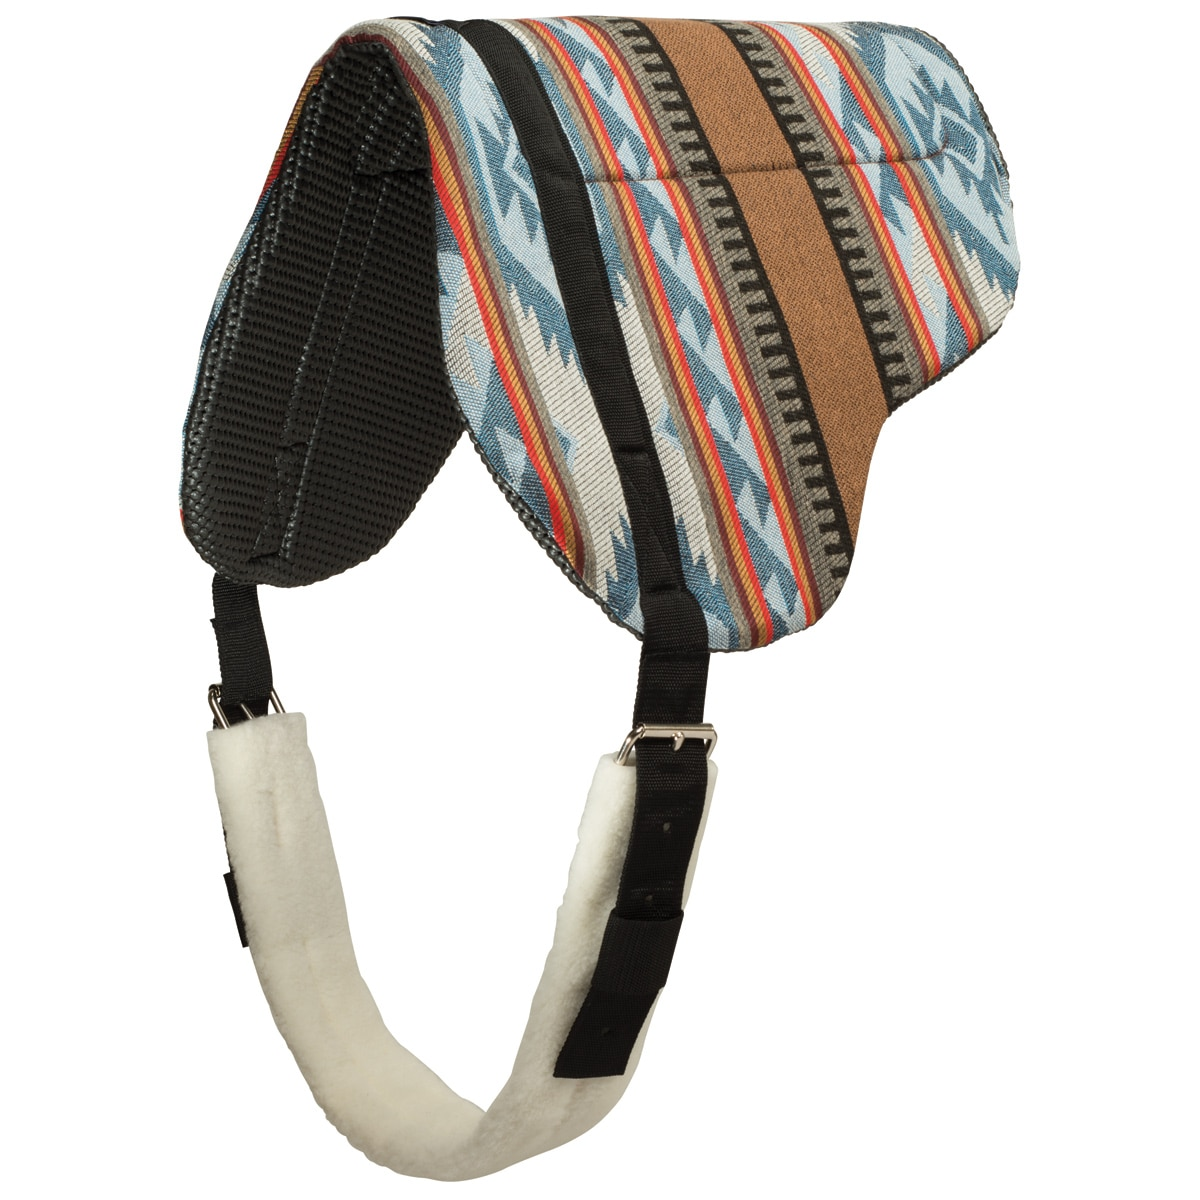 Weaver Bareback Saddle Pad with Tacky-Tack™ Liner